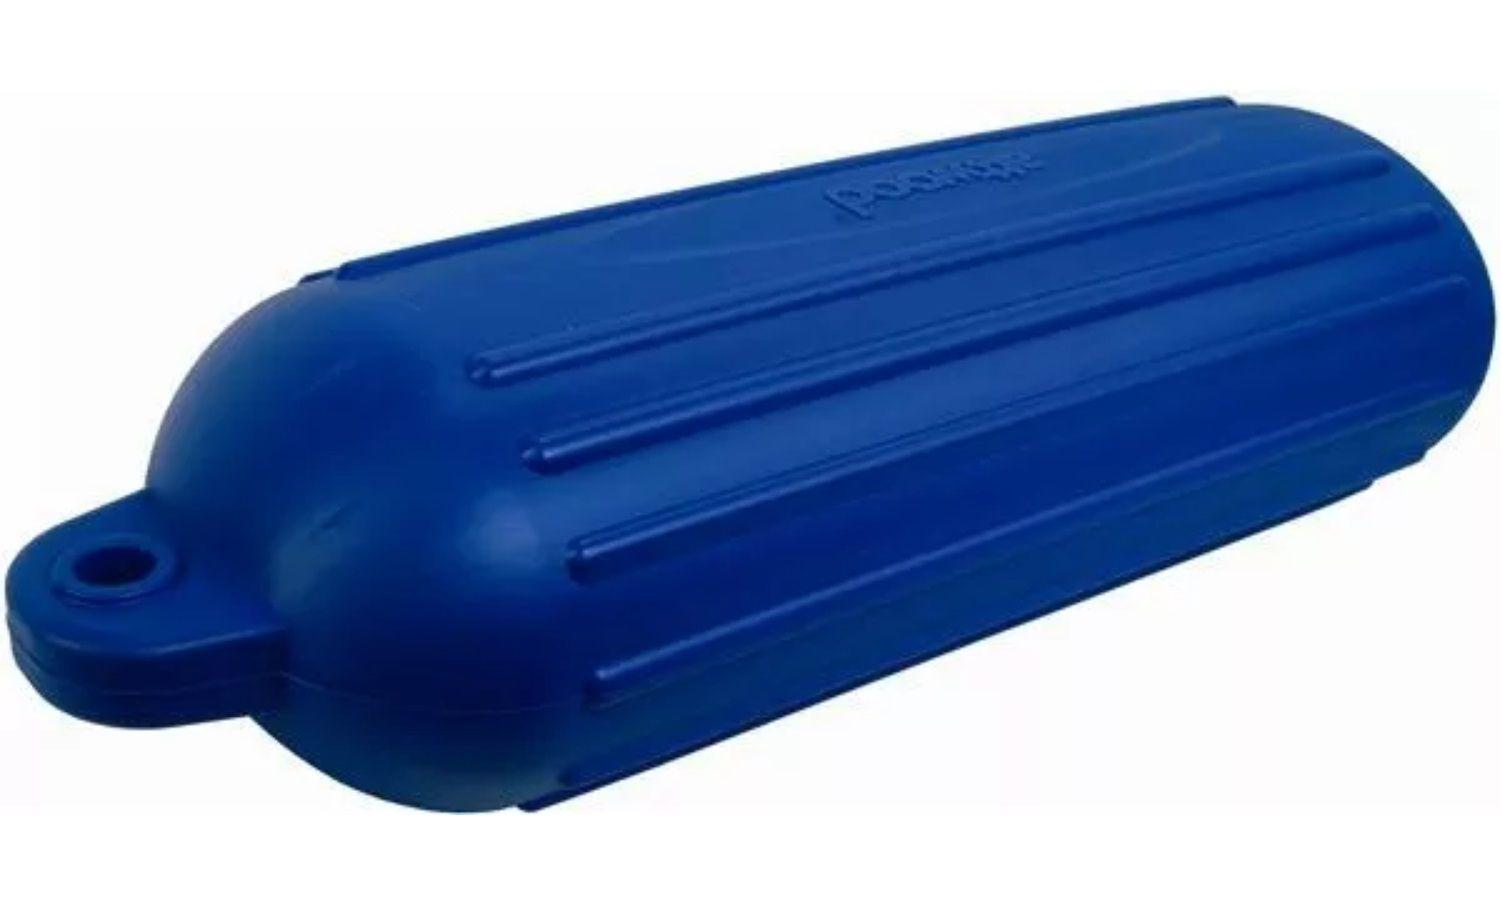 Defensa Náutica G4 Azul 15 X 61 cm Attwood para Barcos e Lanchas